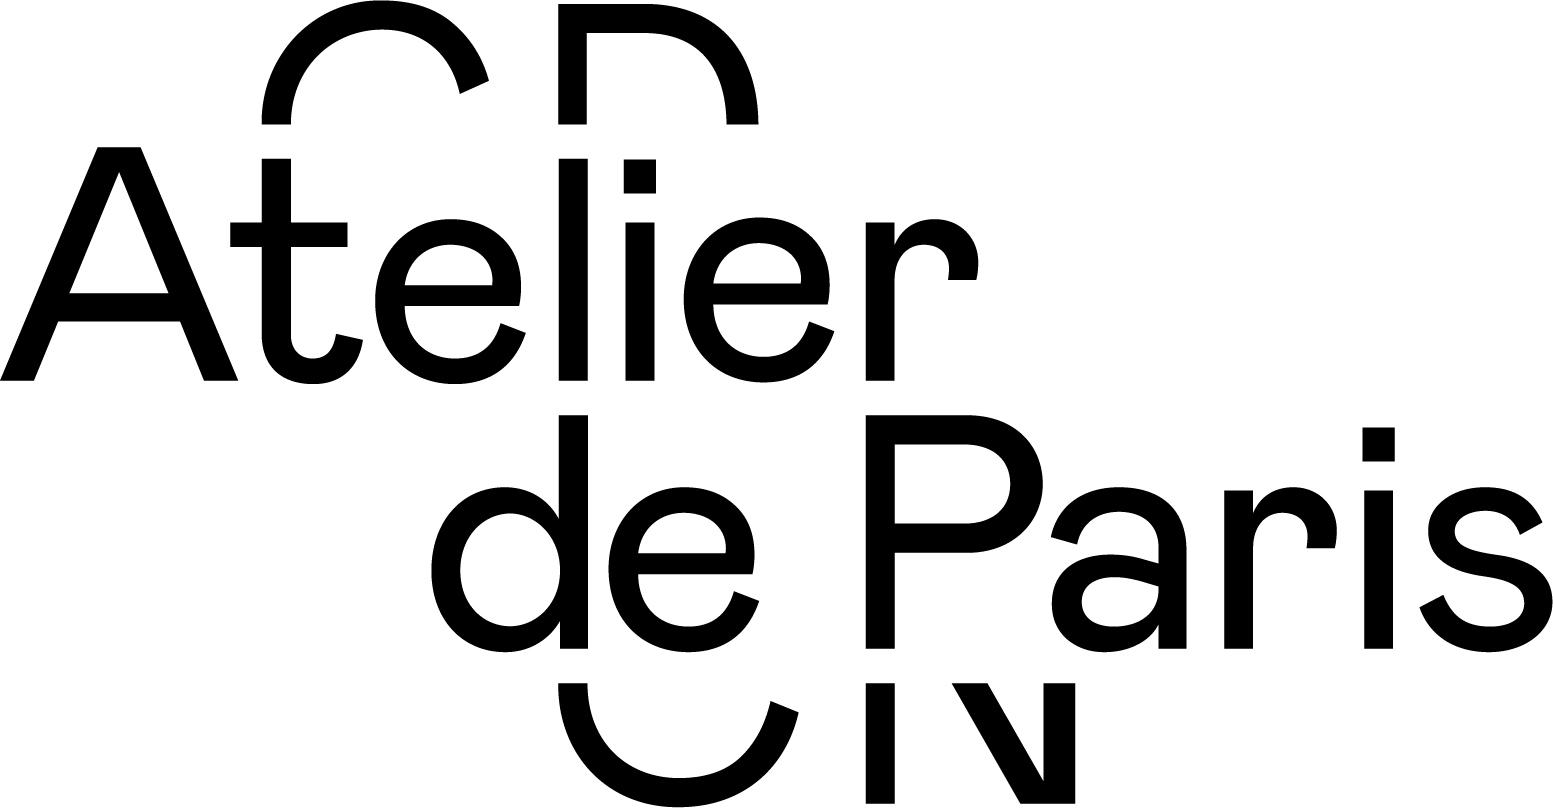 logo-Atelier-de-Paris-cmjn-13x7cm-300dpi.jpg